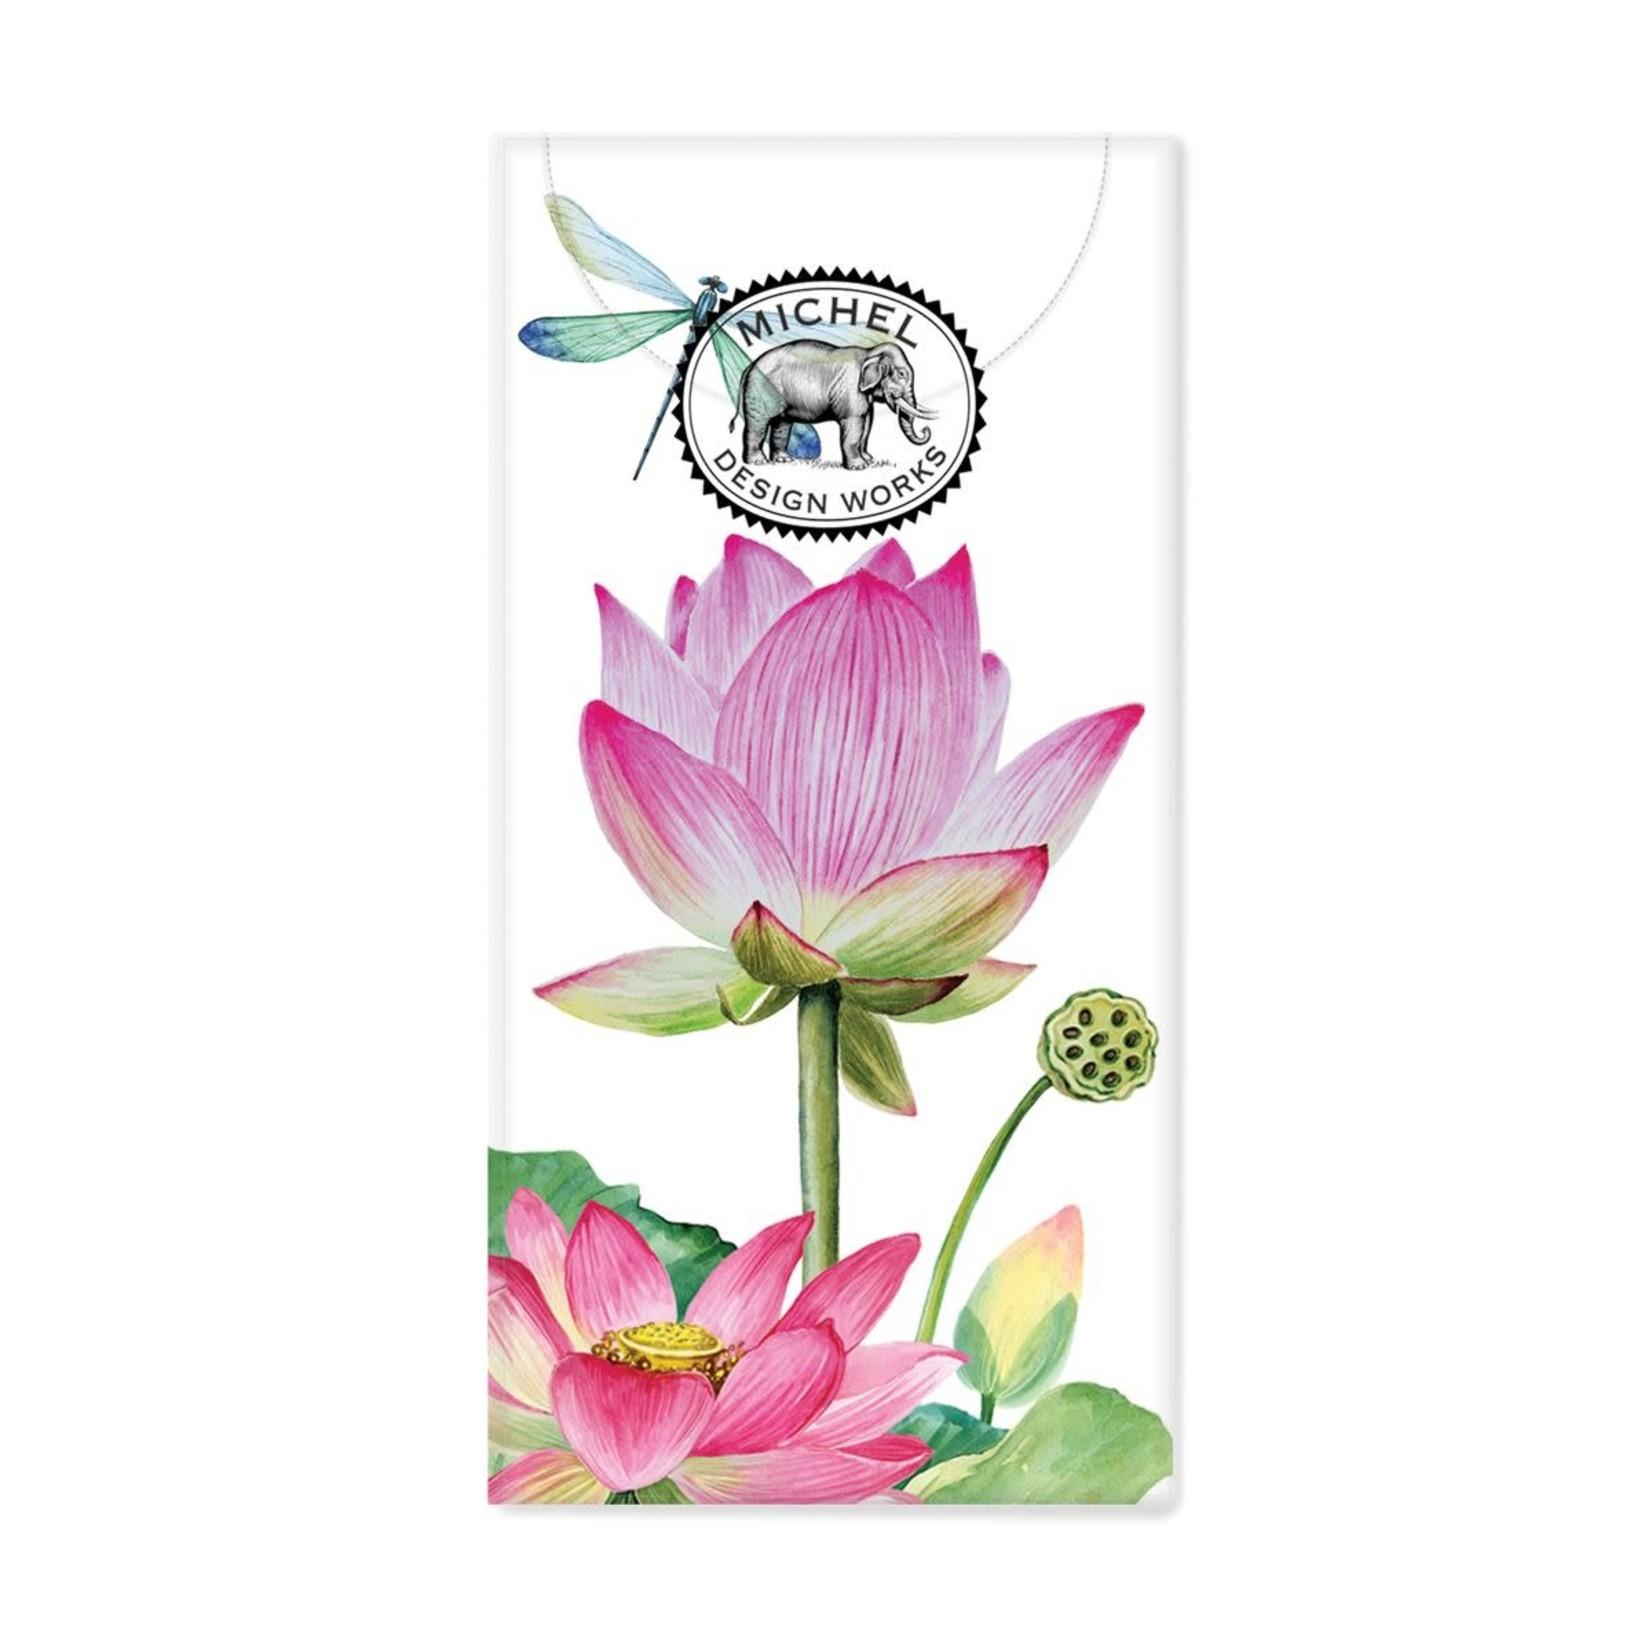 Michel Design Works Water Lilies Pocket Tissues